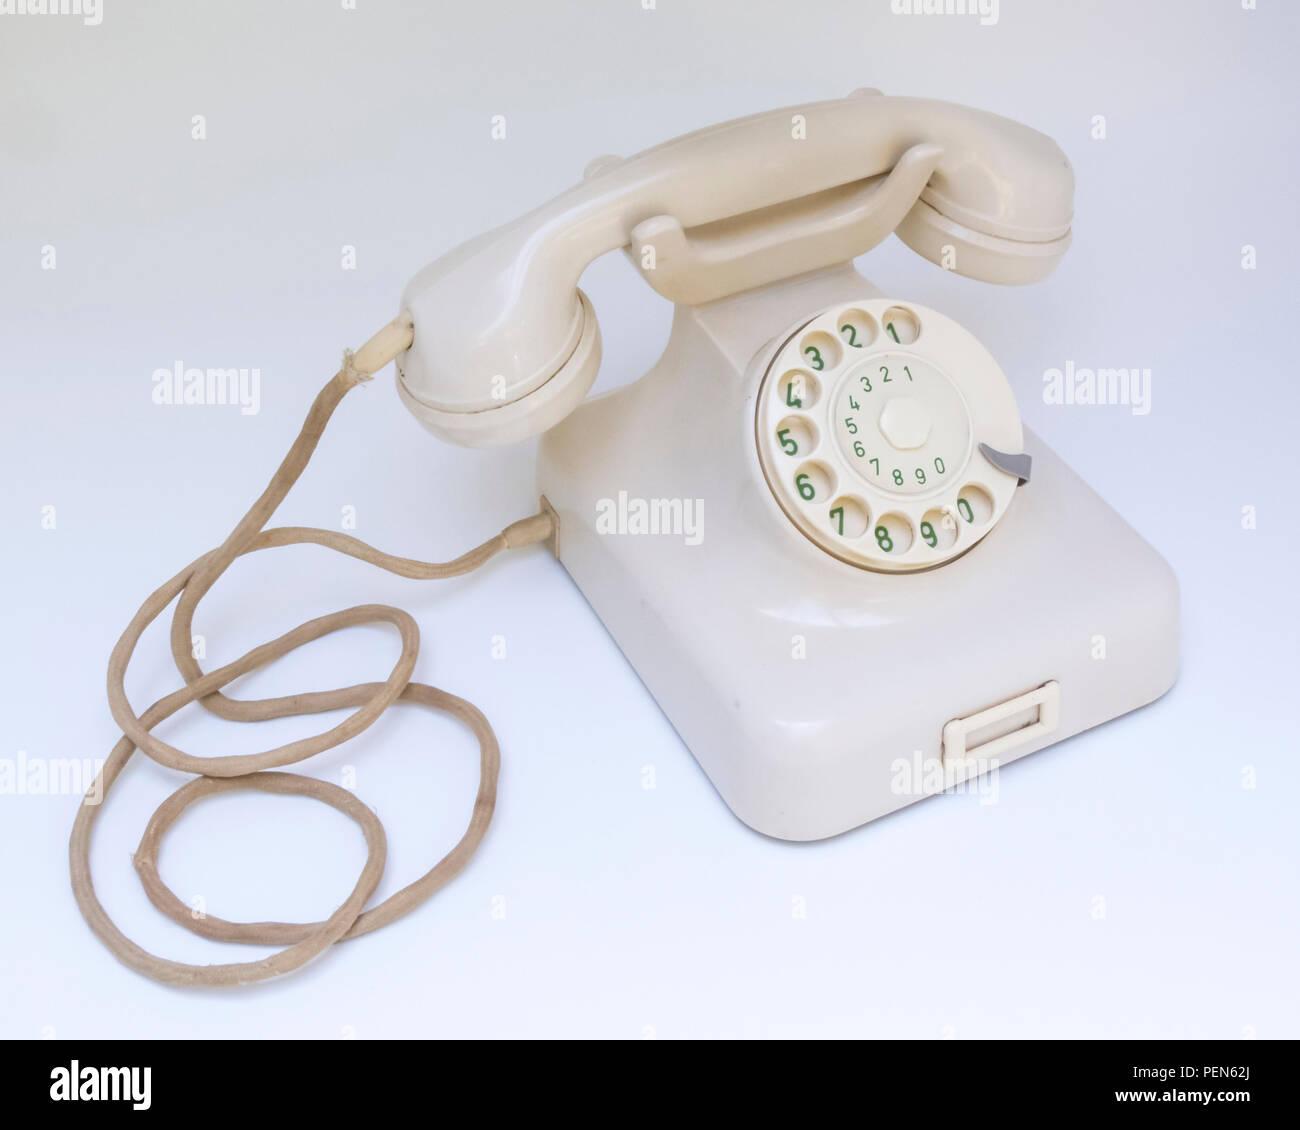 Antikes elfenbeinfarbiges Telefon W48 aus Backelit 50er Jahre Stock Photo